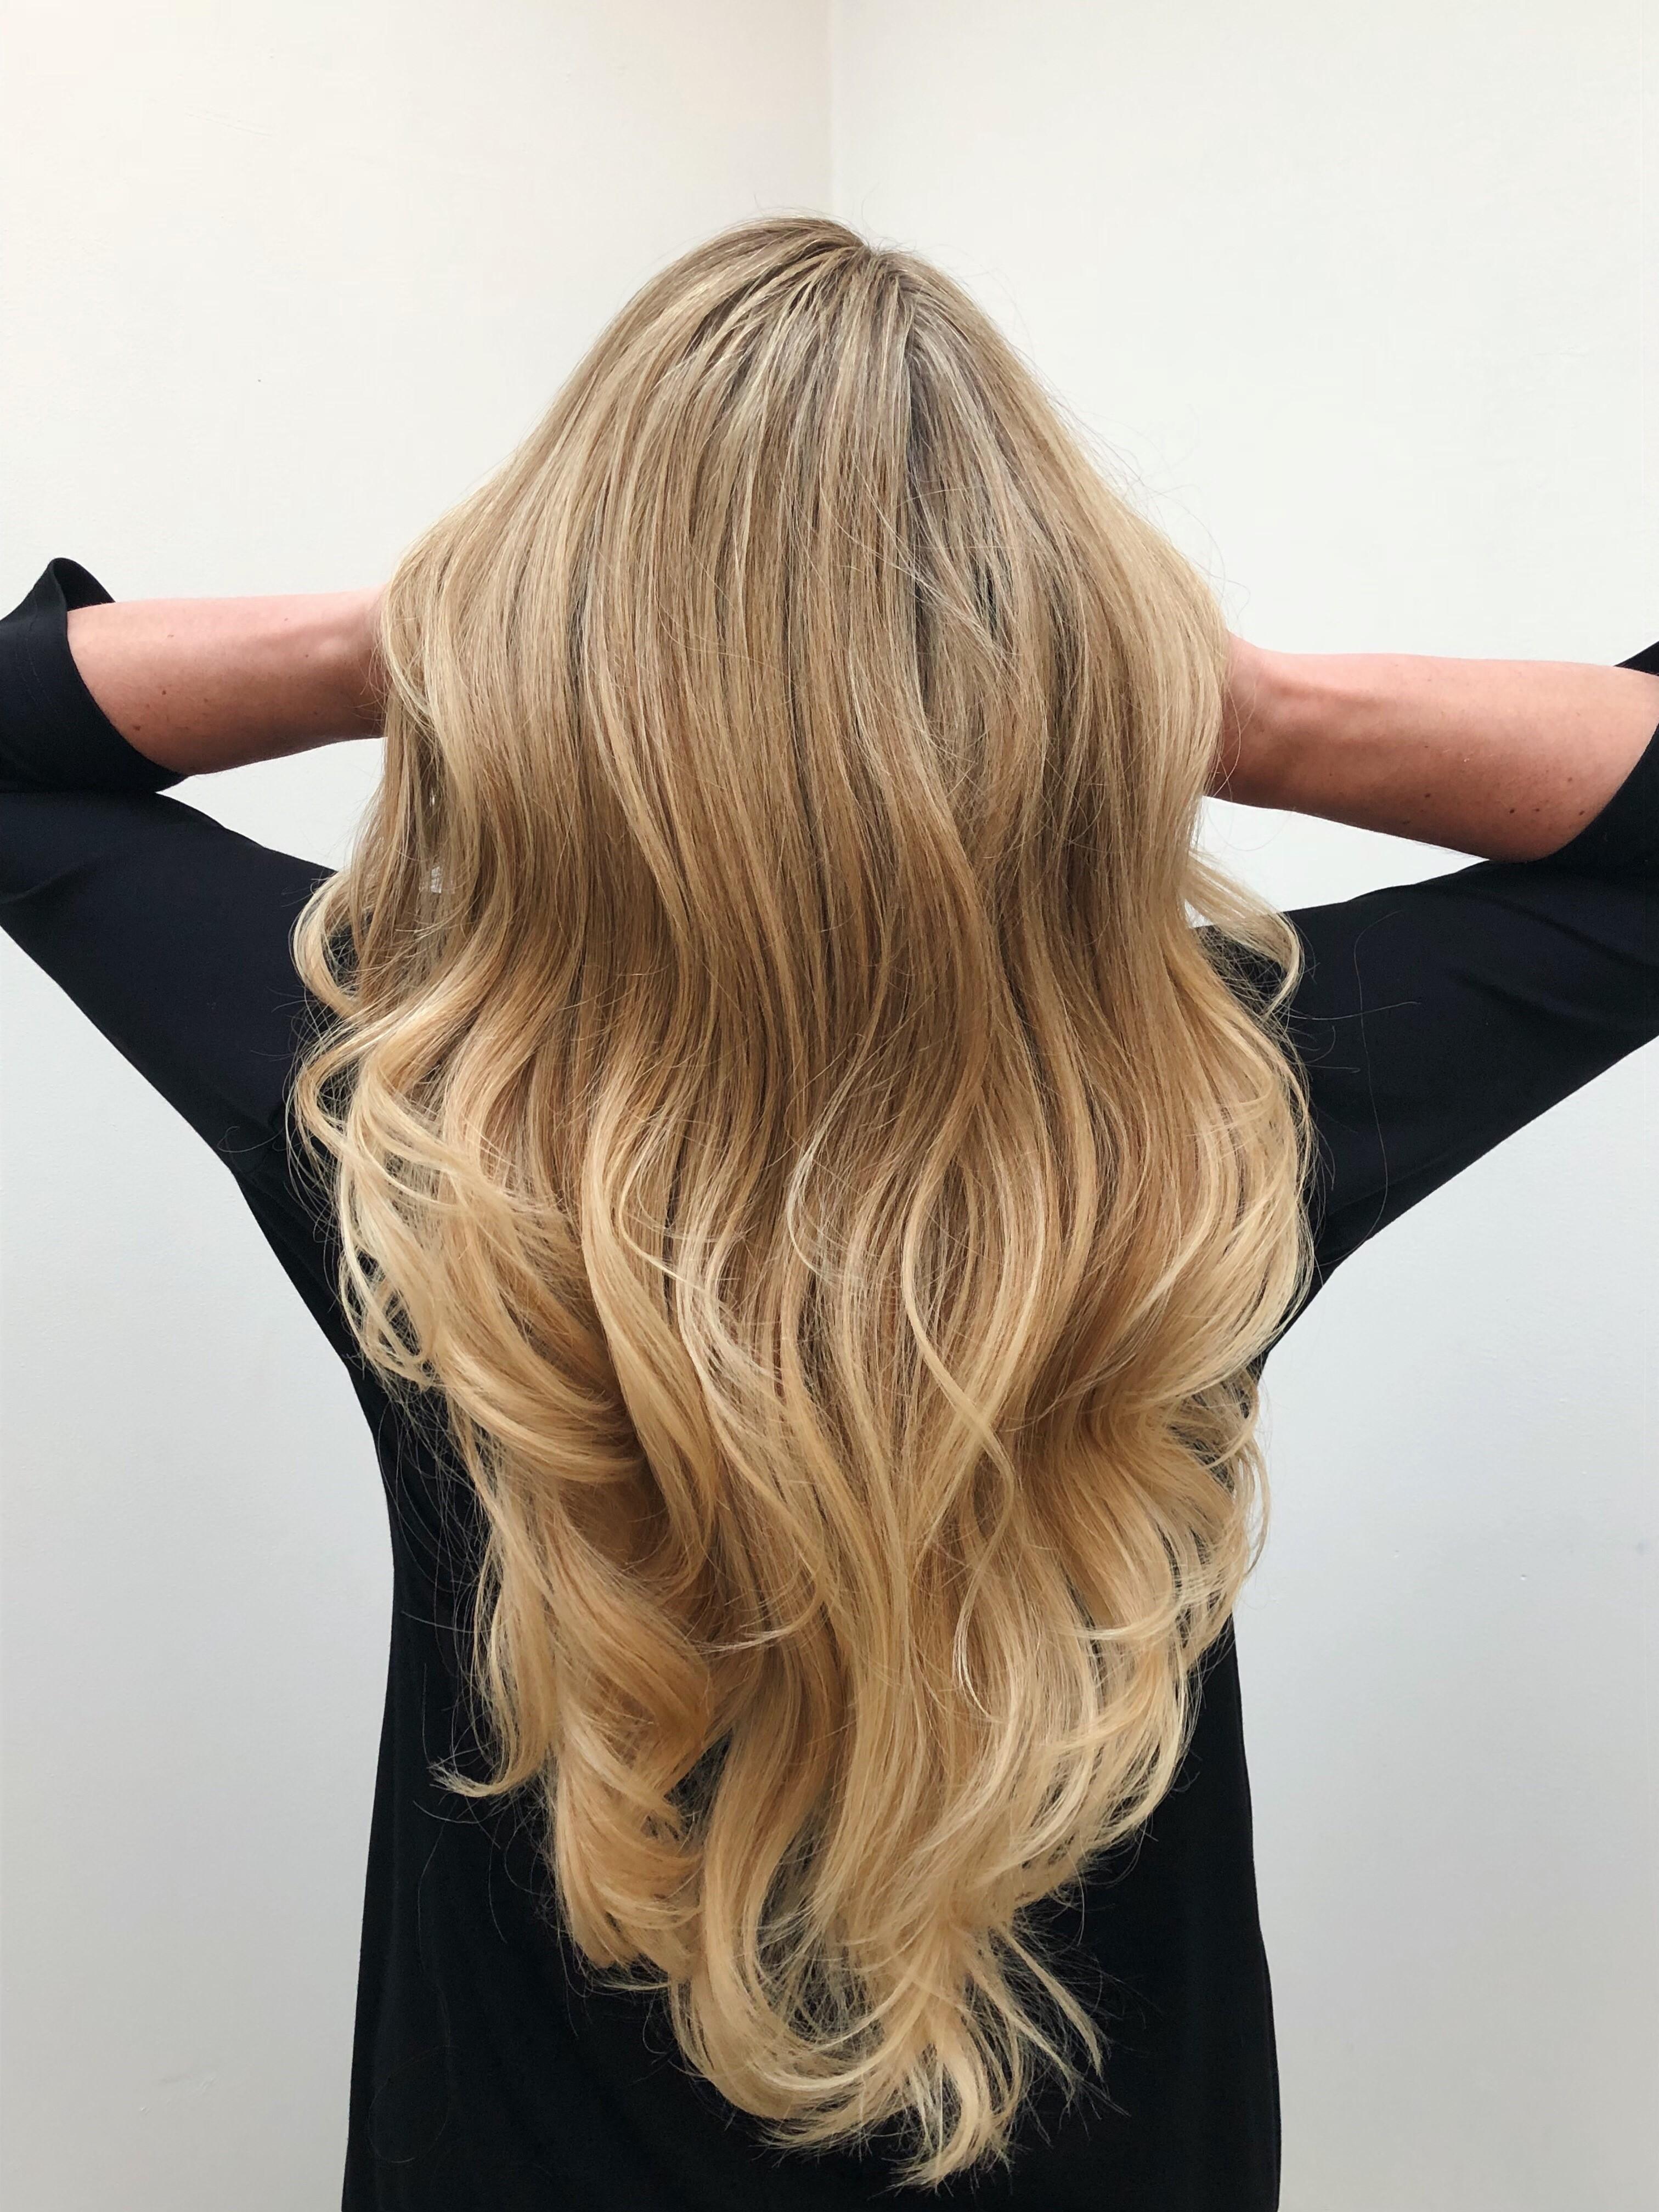 Highlights Folie Voor Perfect Blond Of Intens Bruin Haar